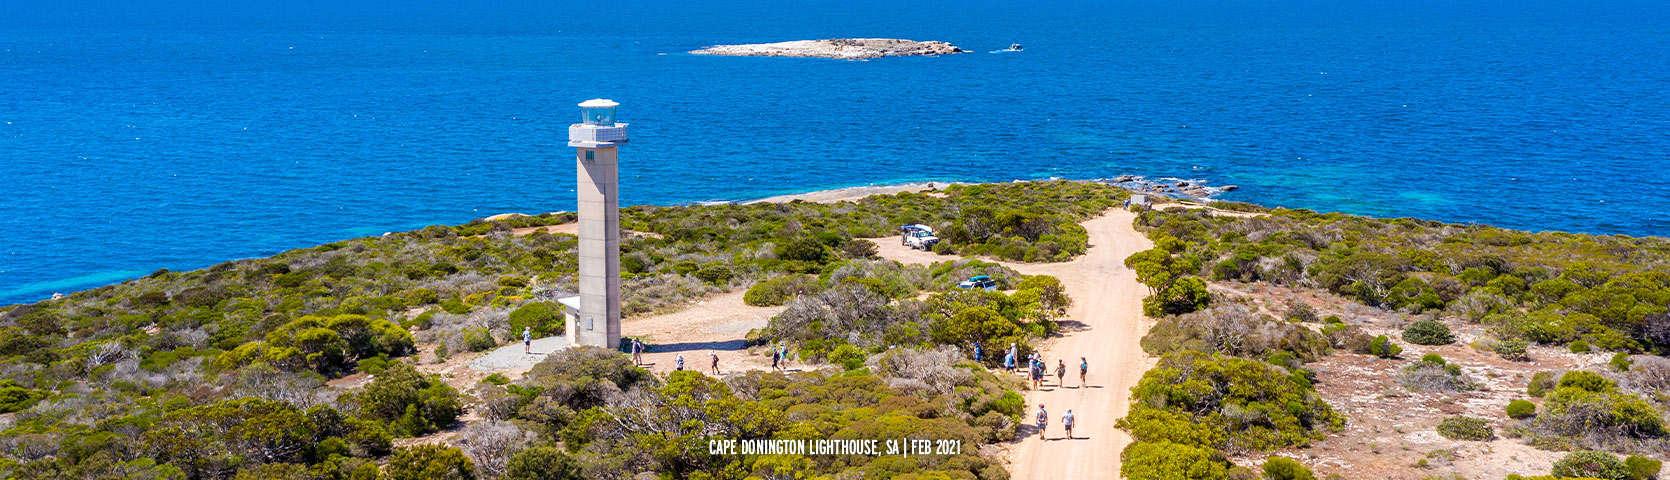 Cape-Donington-Lighthouse-South-Australia